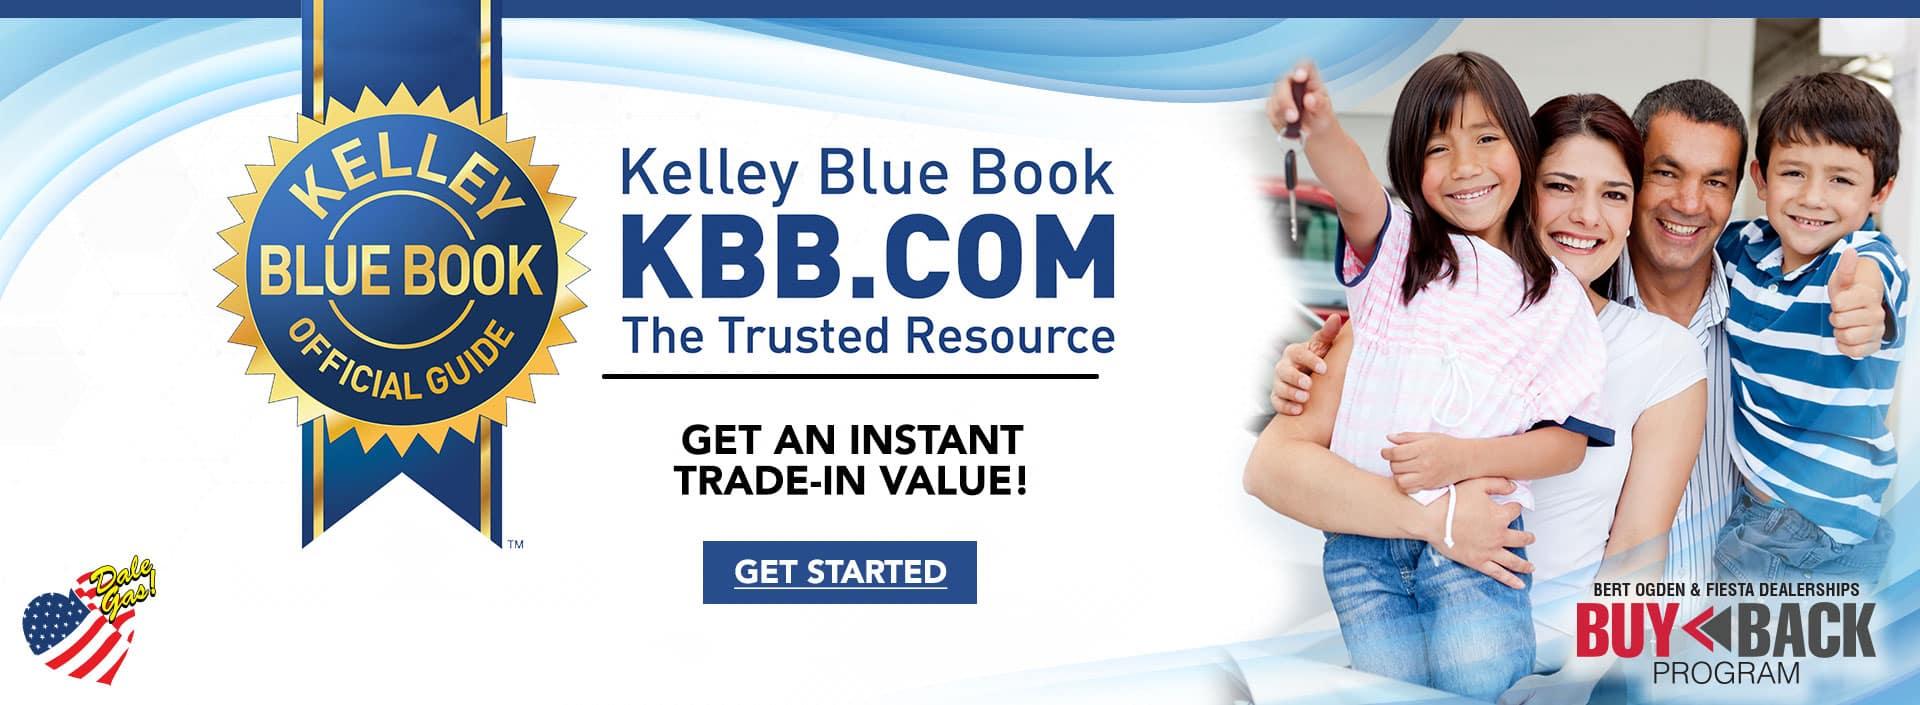 KBB_004_v2 (1)